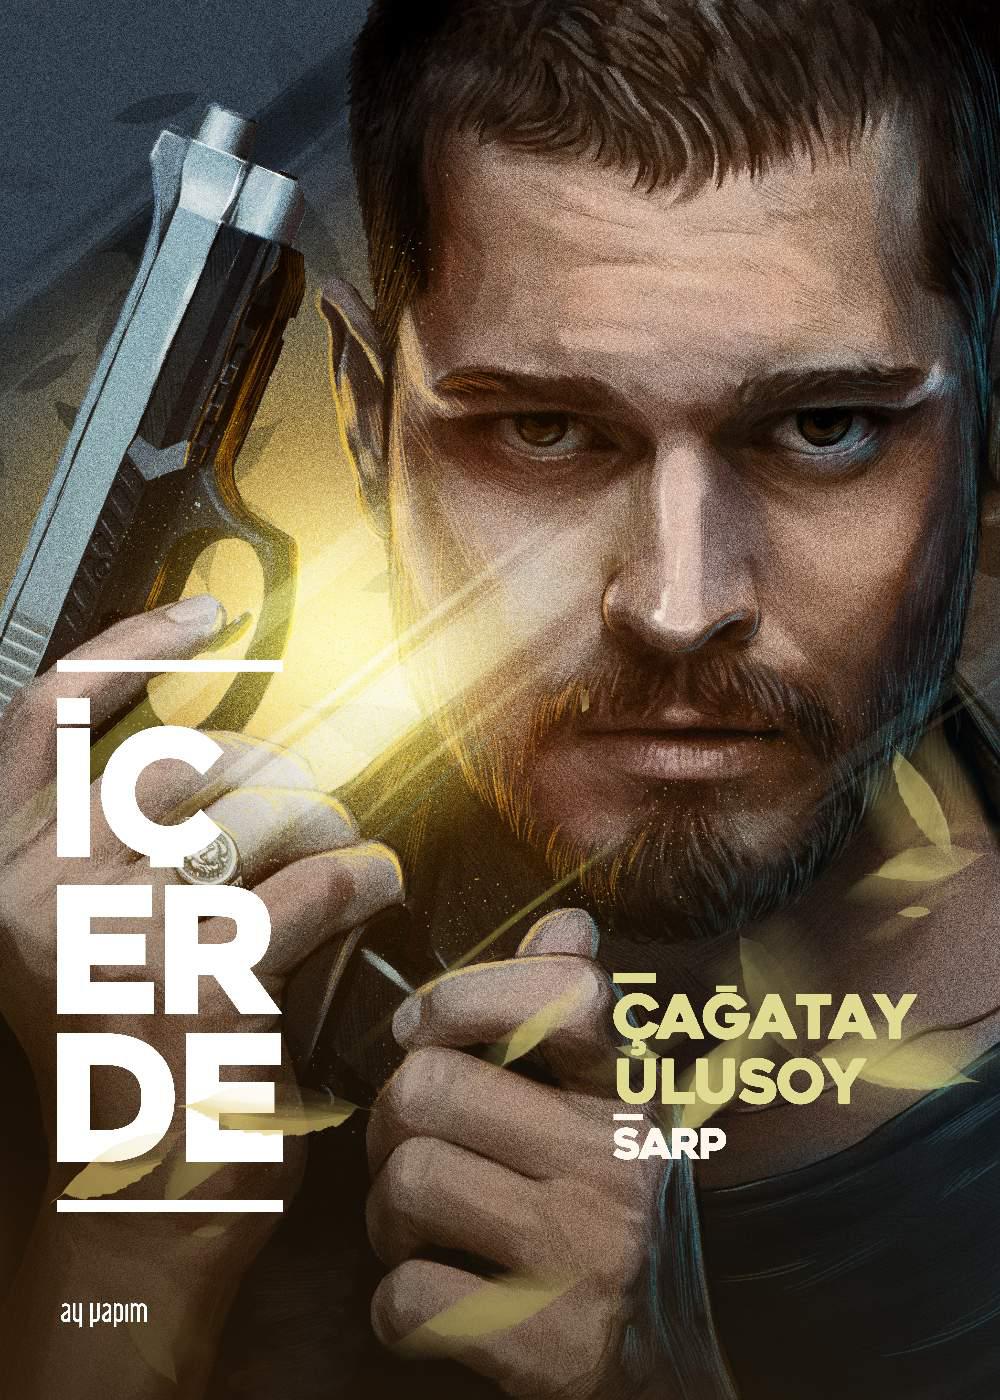 Icerde-Sarp-1000